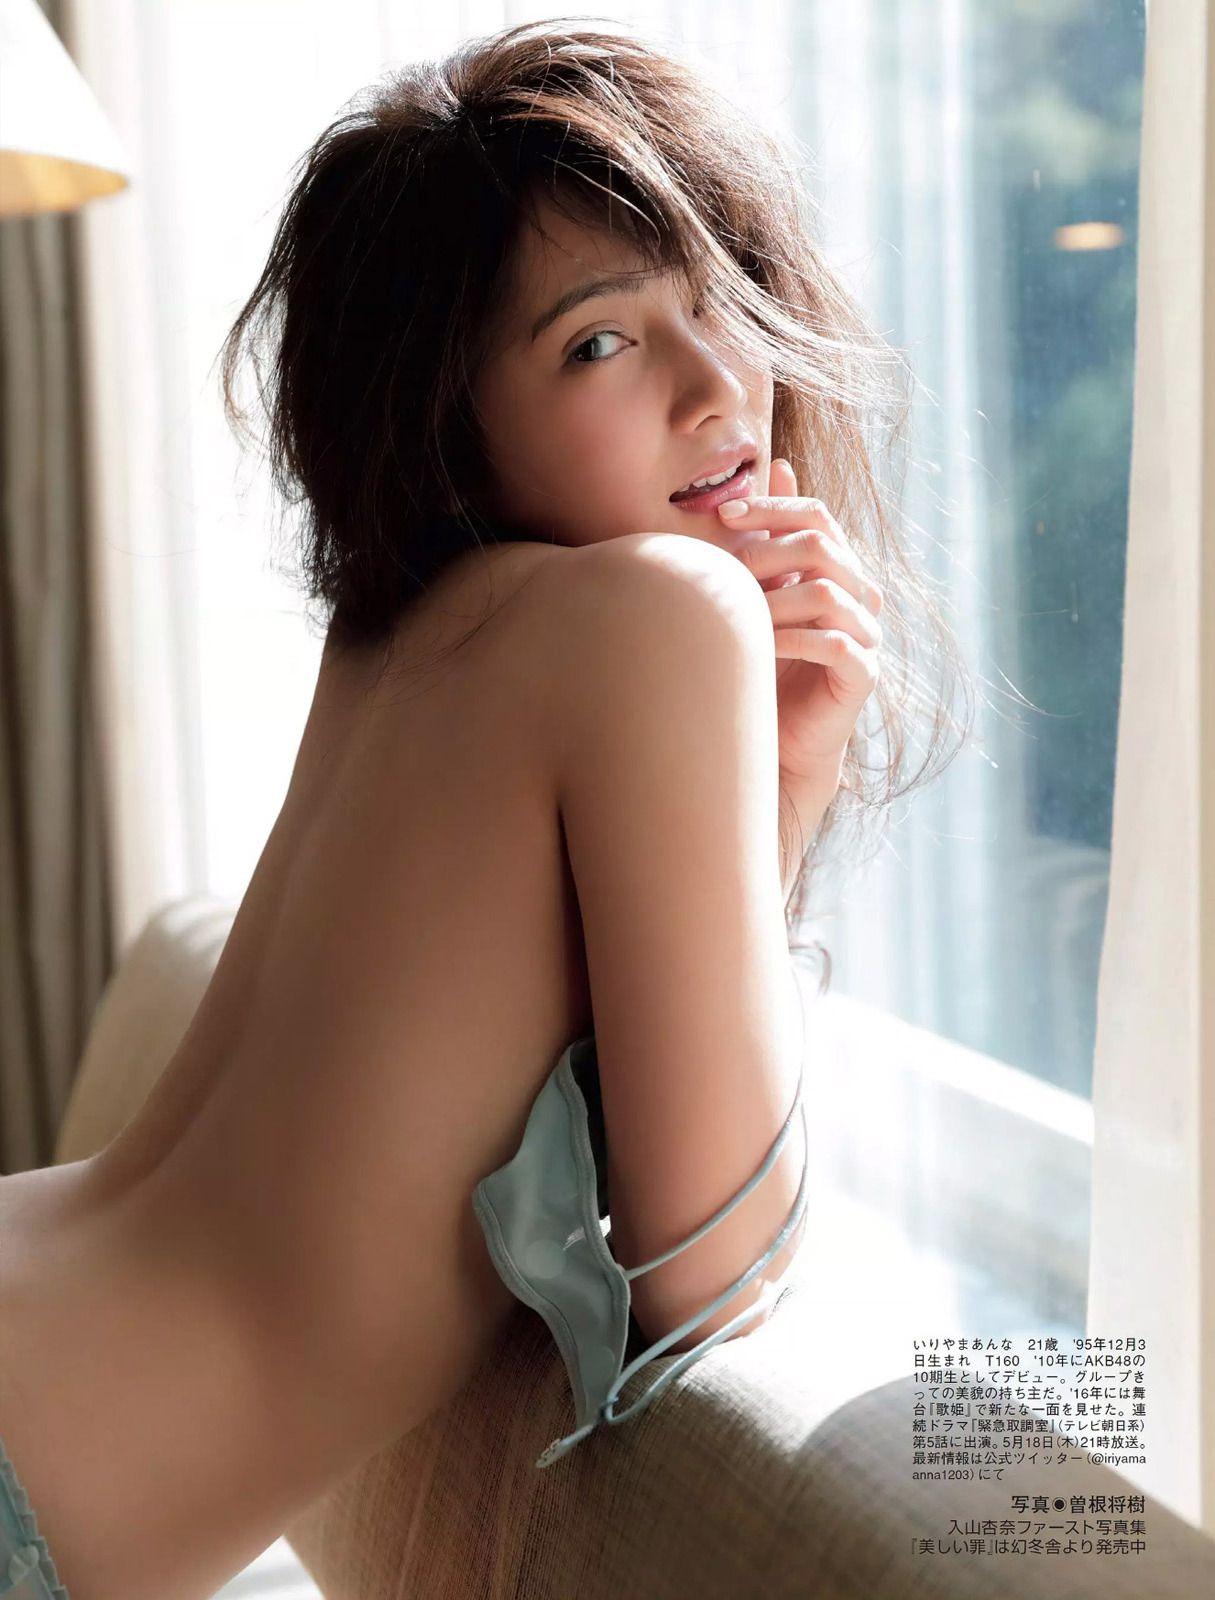 hashimoto lesbian singles Jav tube | japanese porn streaming  the loli-slut kiss of a schoolgirl who loves paid dating shuri  hot smothering kisses lesbian series.